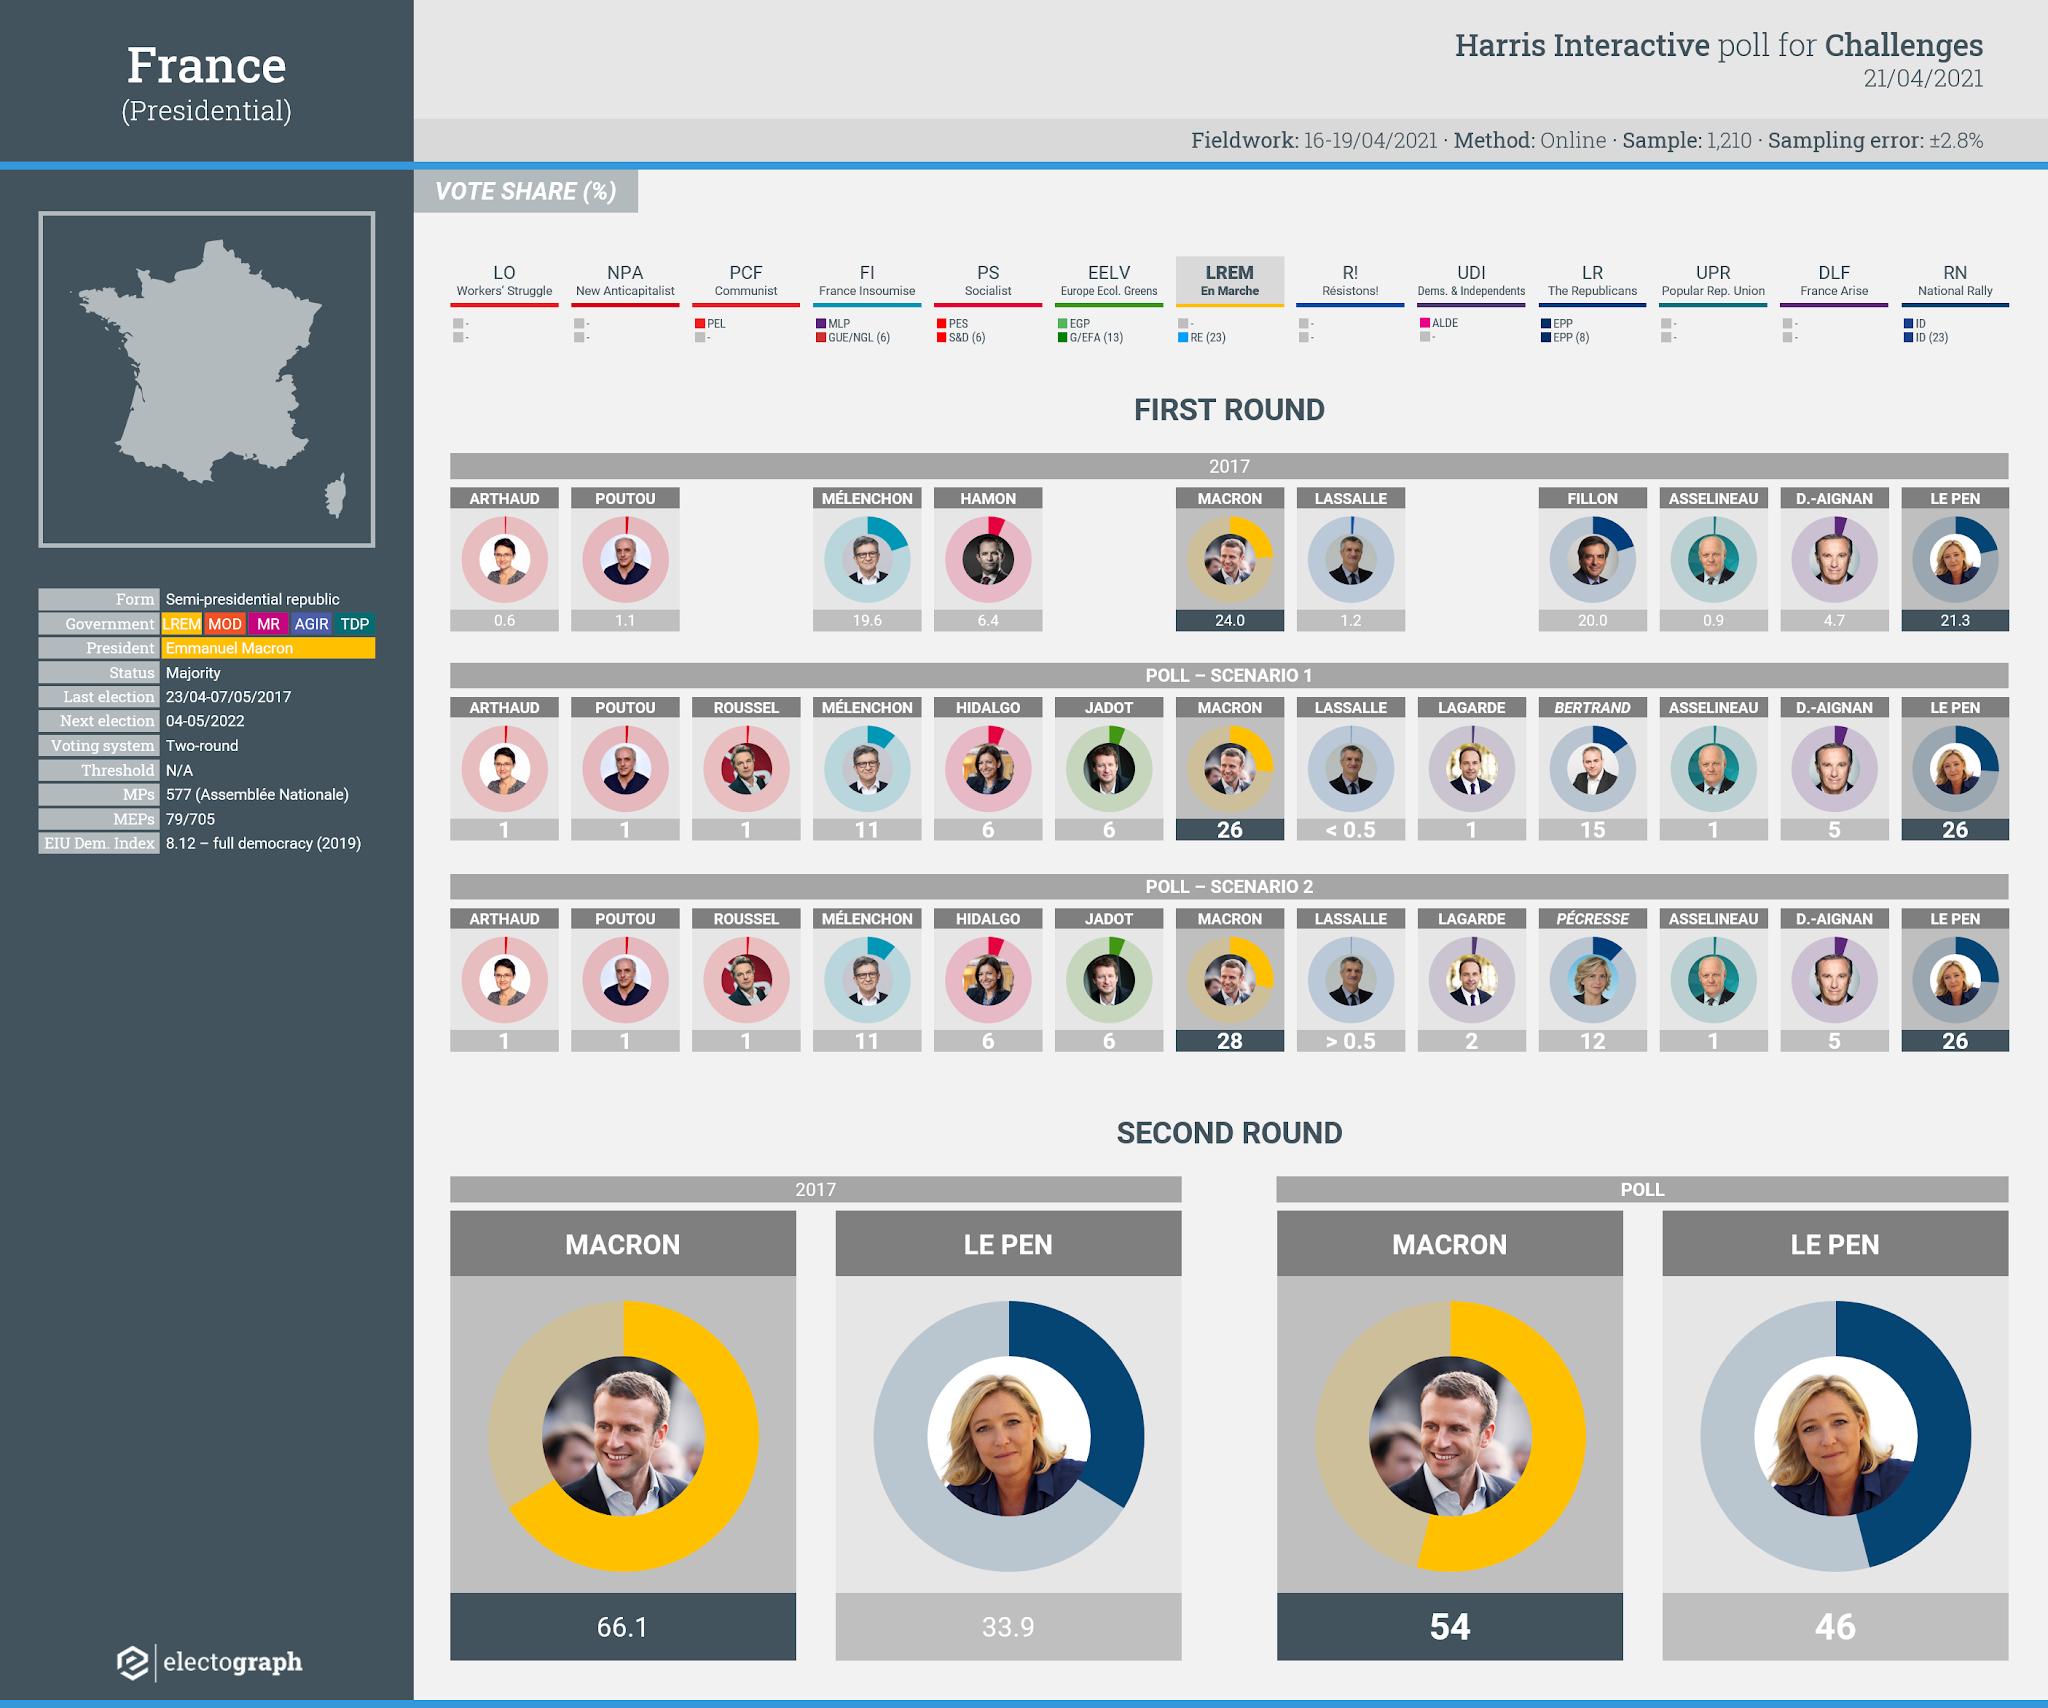 FRANCE: Harris Interactive poll chart, 21 April 2021